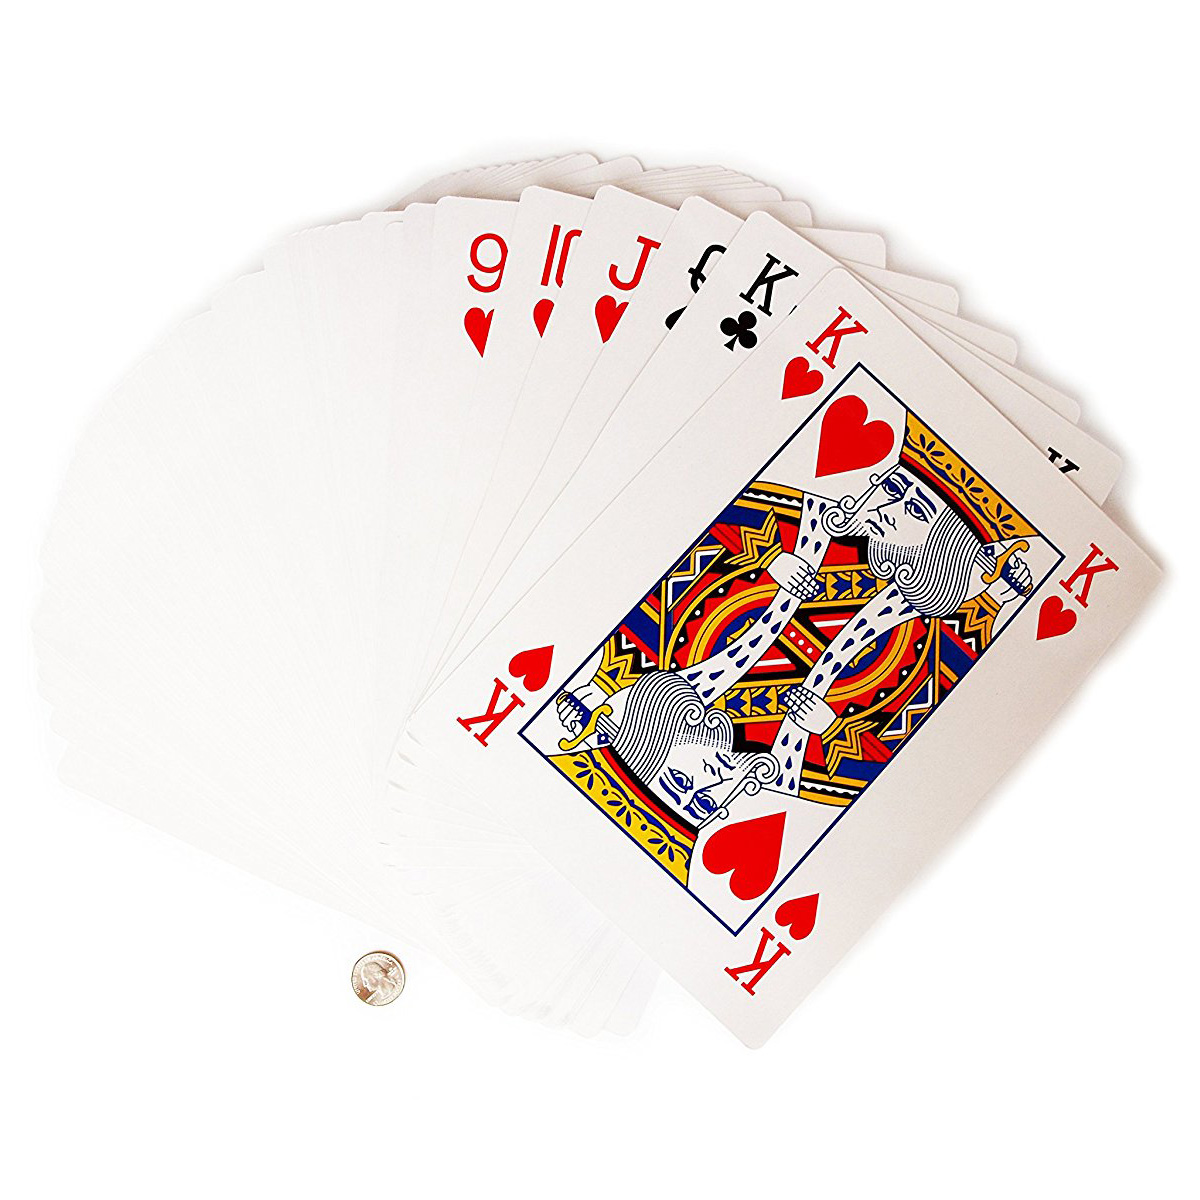 gigantic-deck-of-playing-cards-5.jpg (1200×1200)